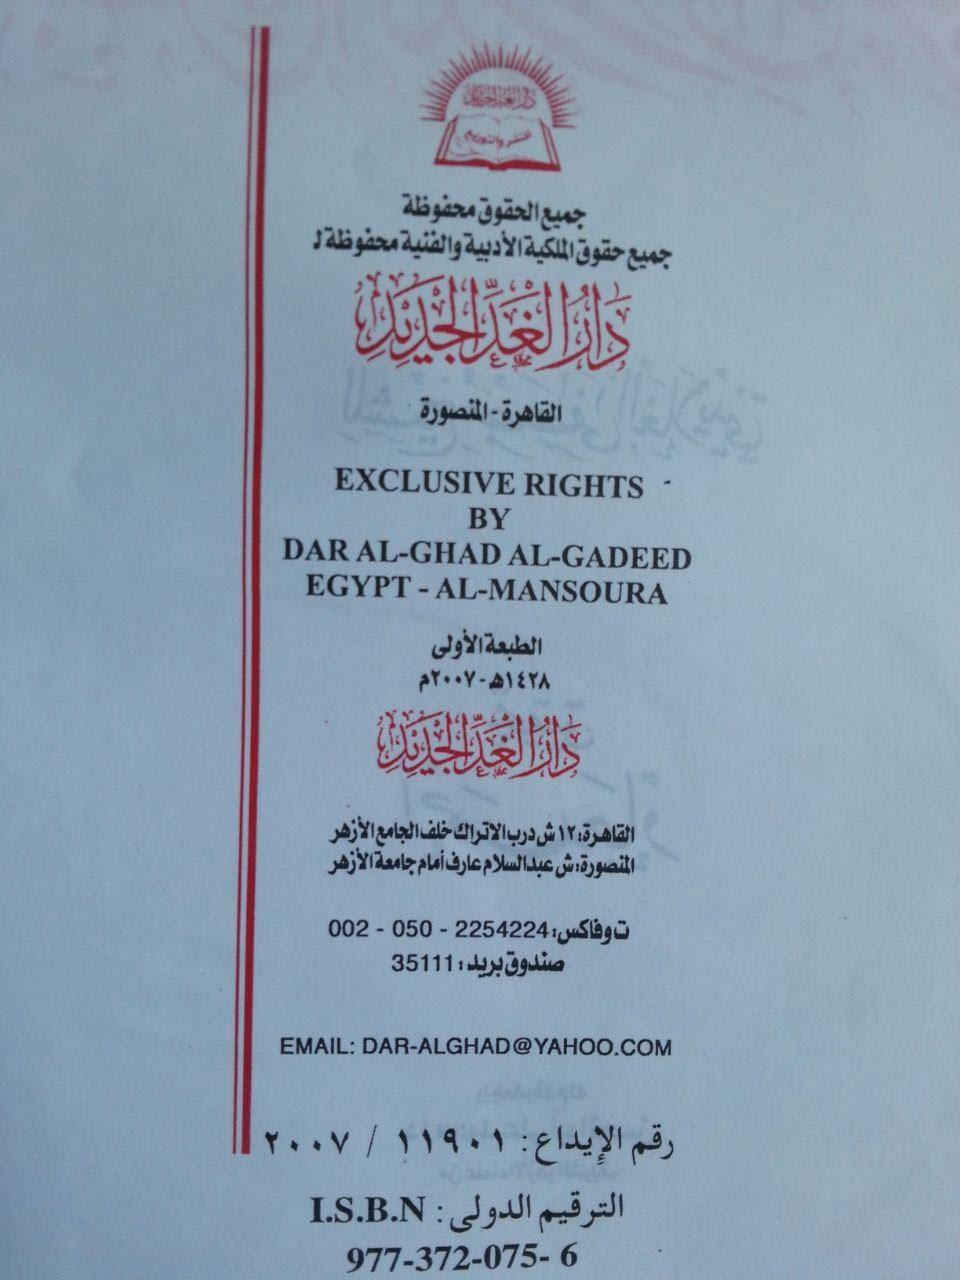 Kitab Jami Ad-Durus Al-Arabiyah Ekonomis isi